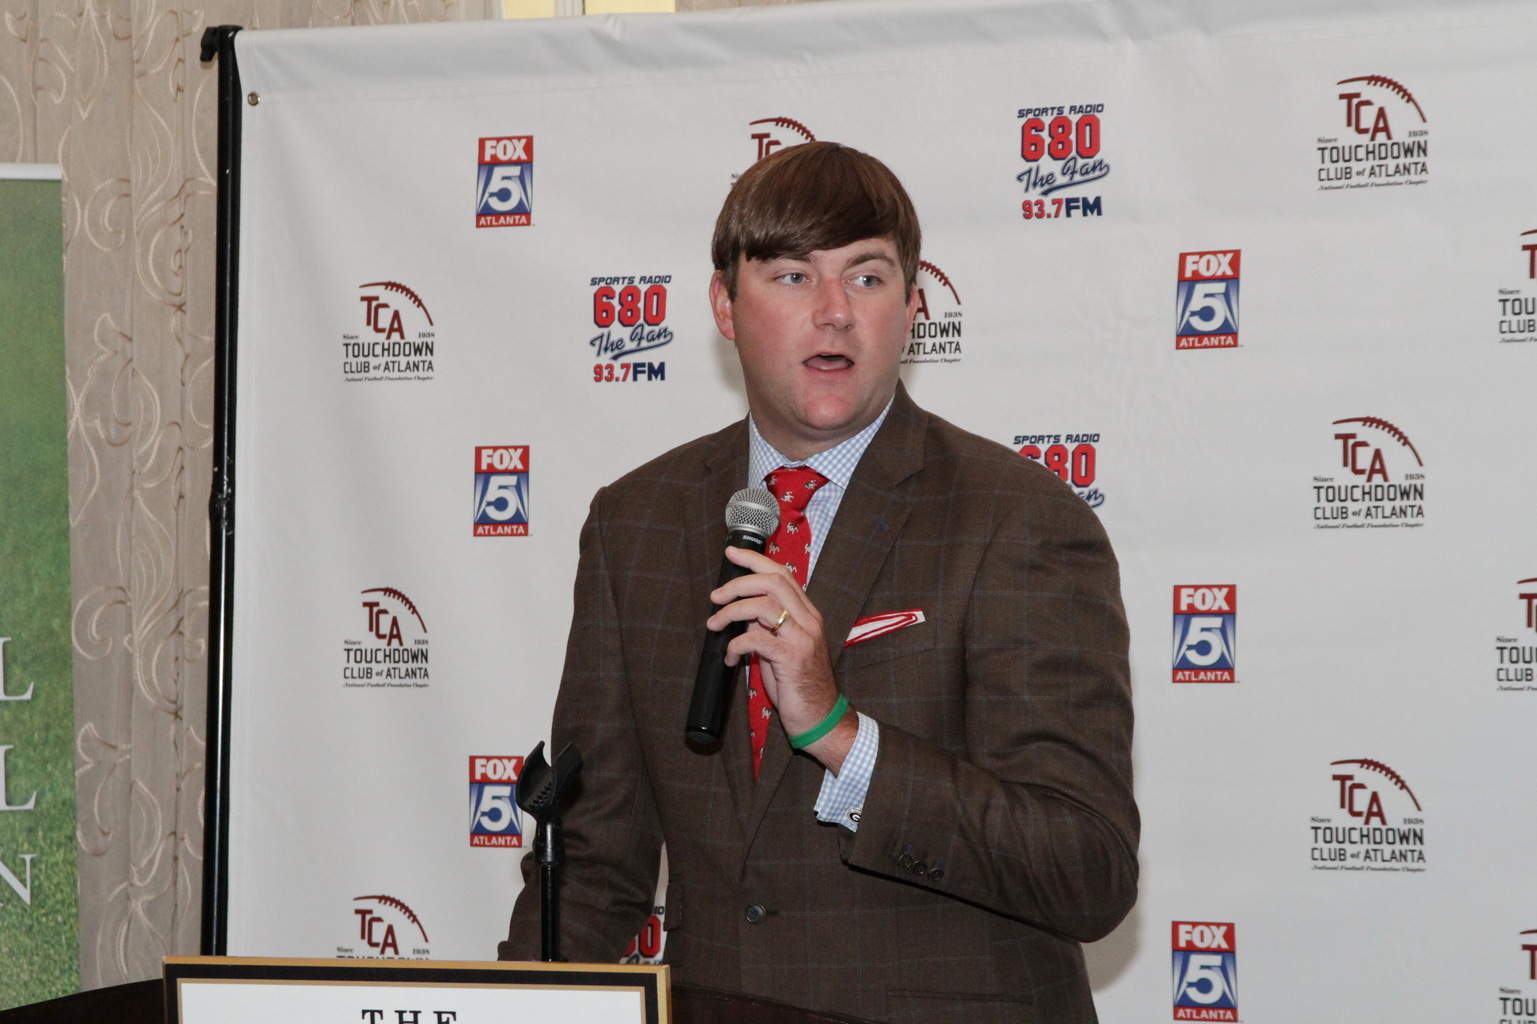 TCA President Justin Clay